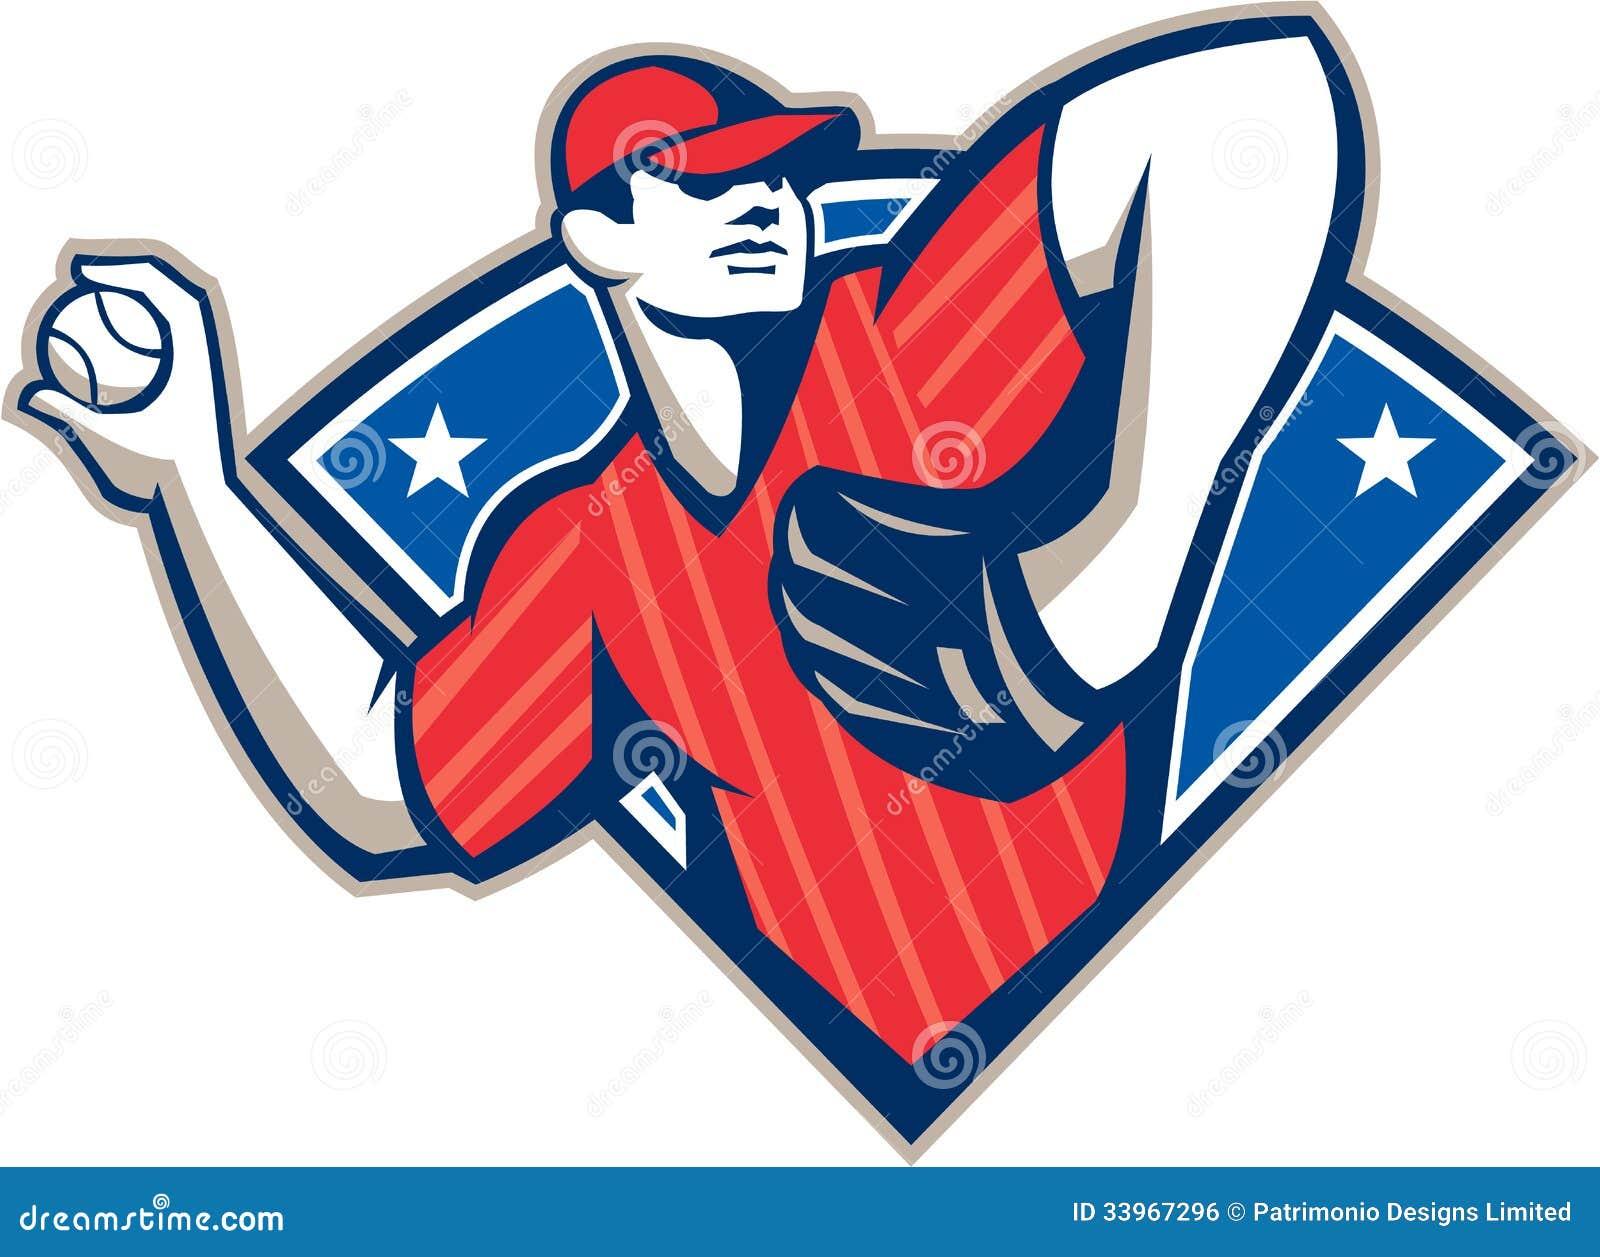 Baseball Pitcher Throwing Ball Retro Stock Vector - Image ...